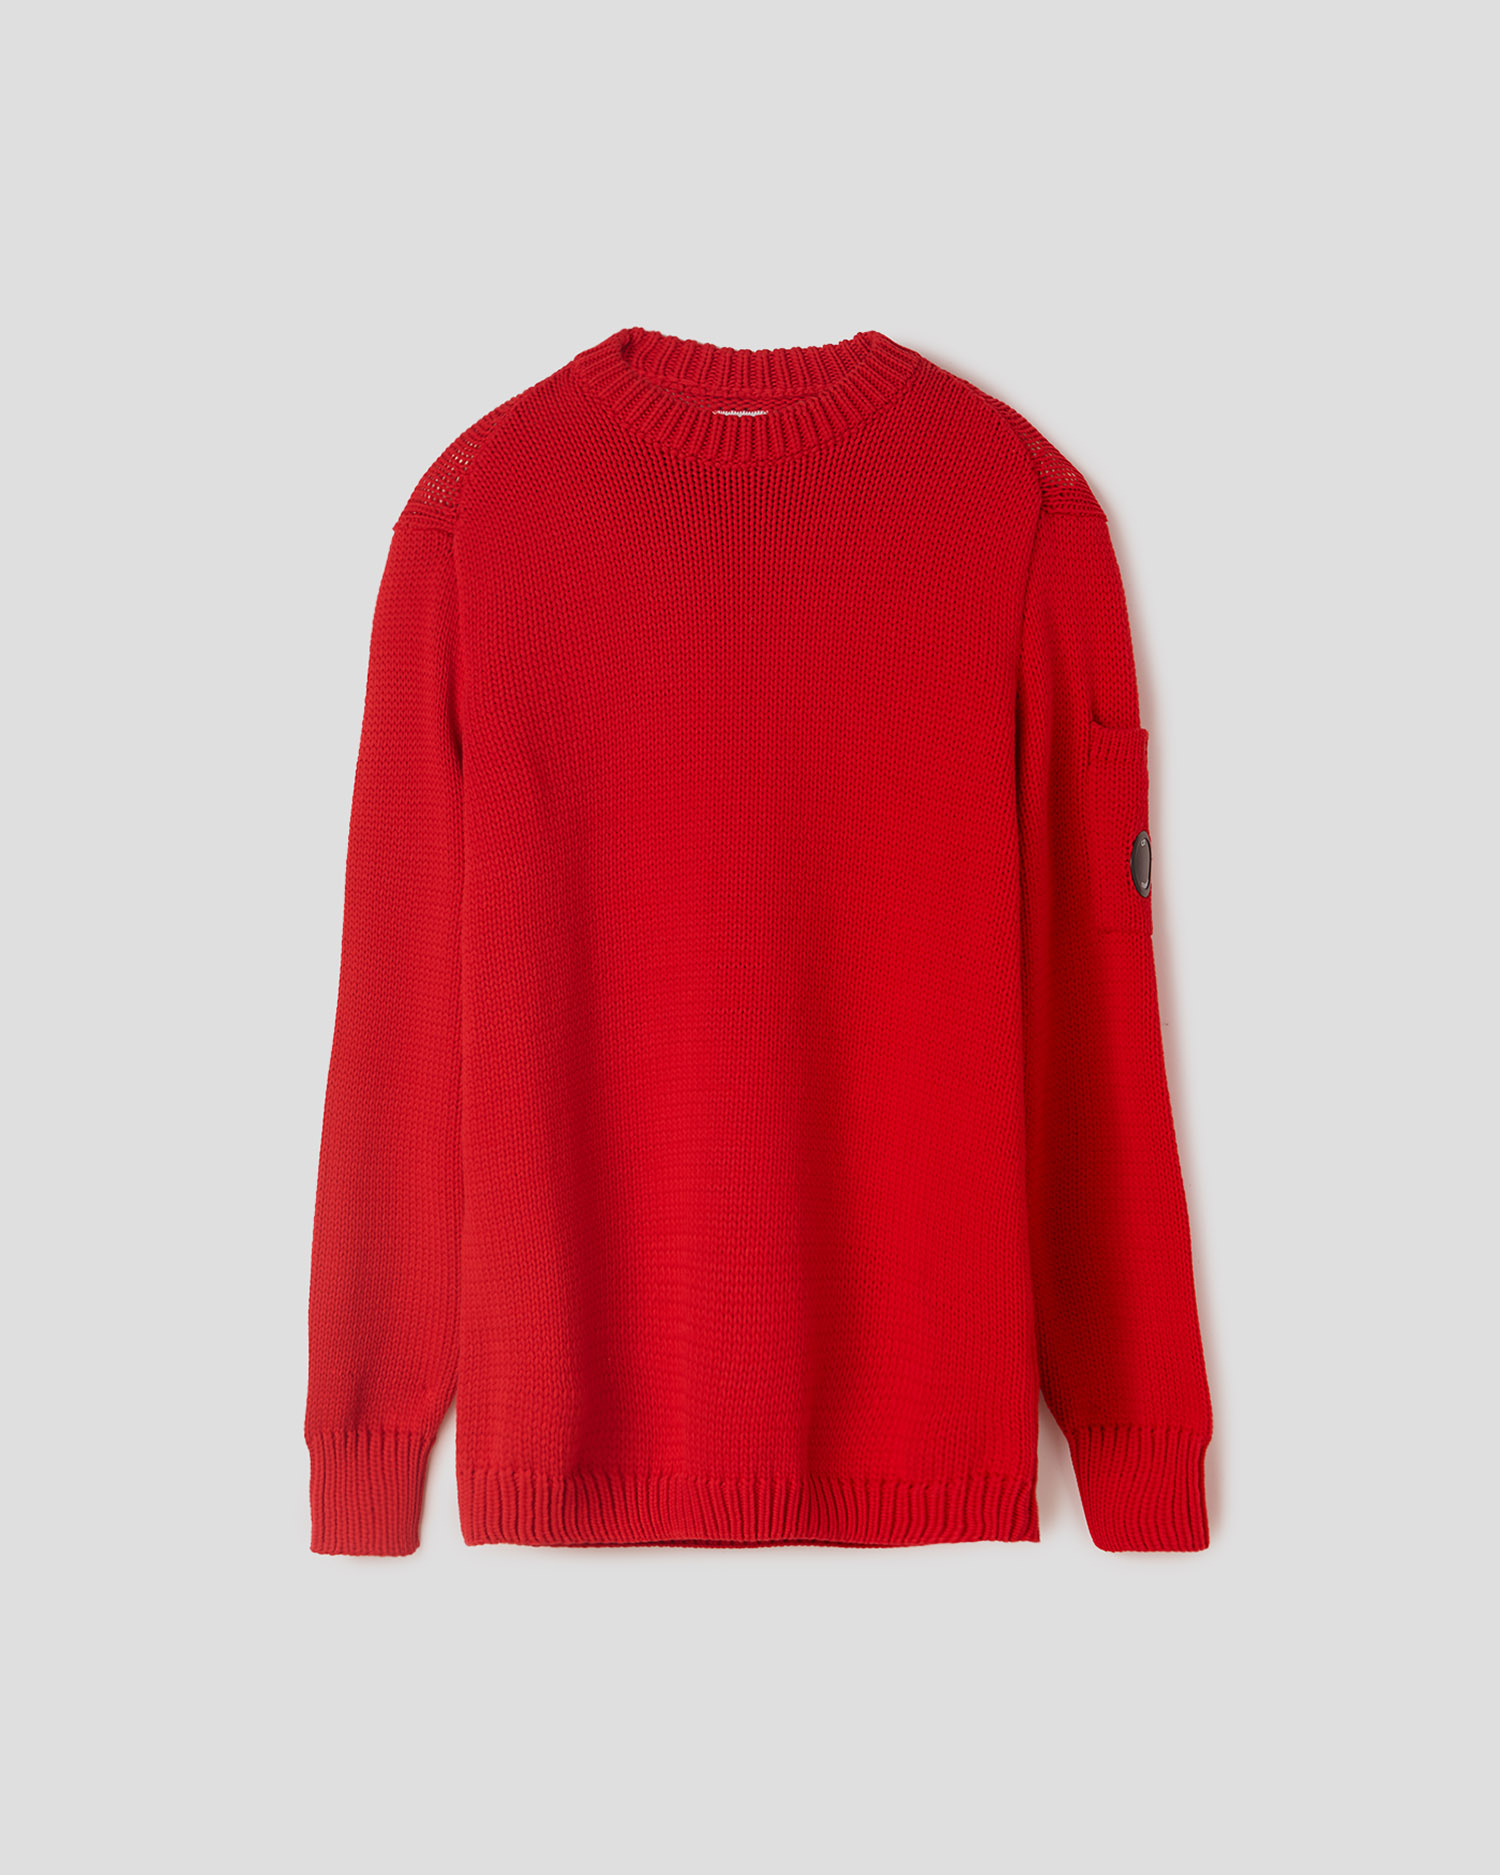 Shirt CP Company CP COMPANY | 1 | 09CMKN253A005868A561